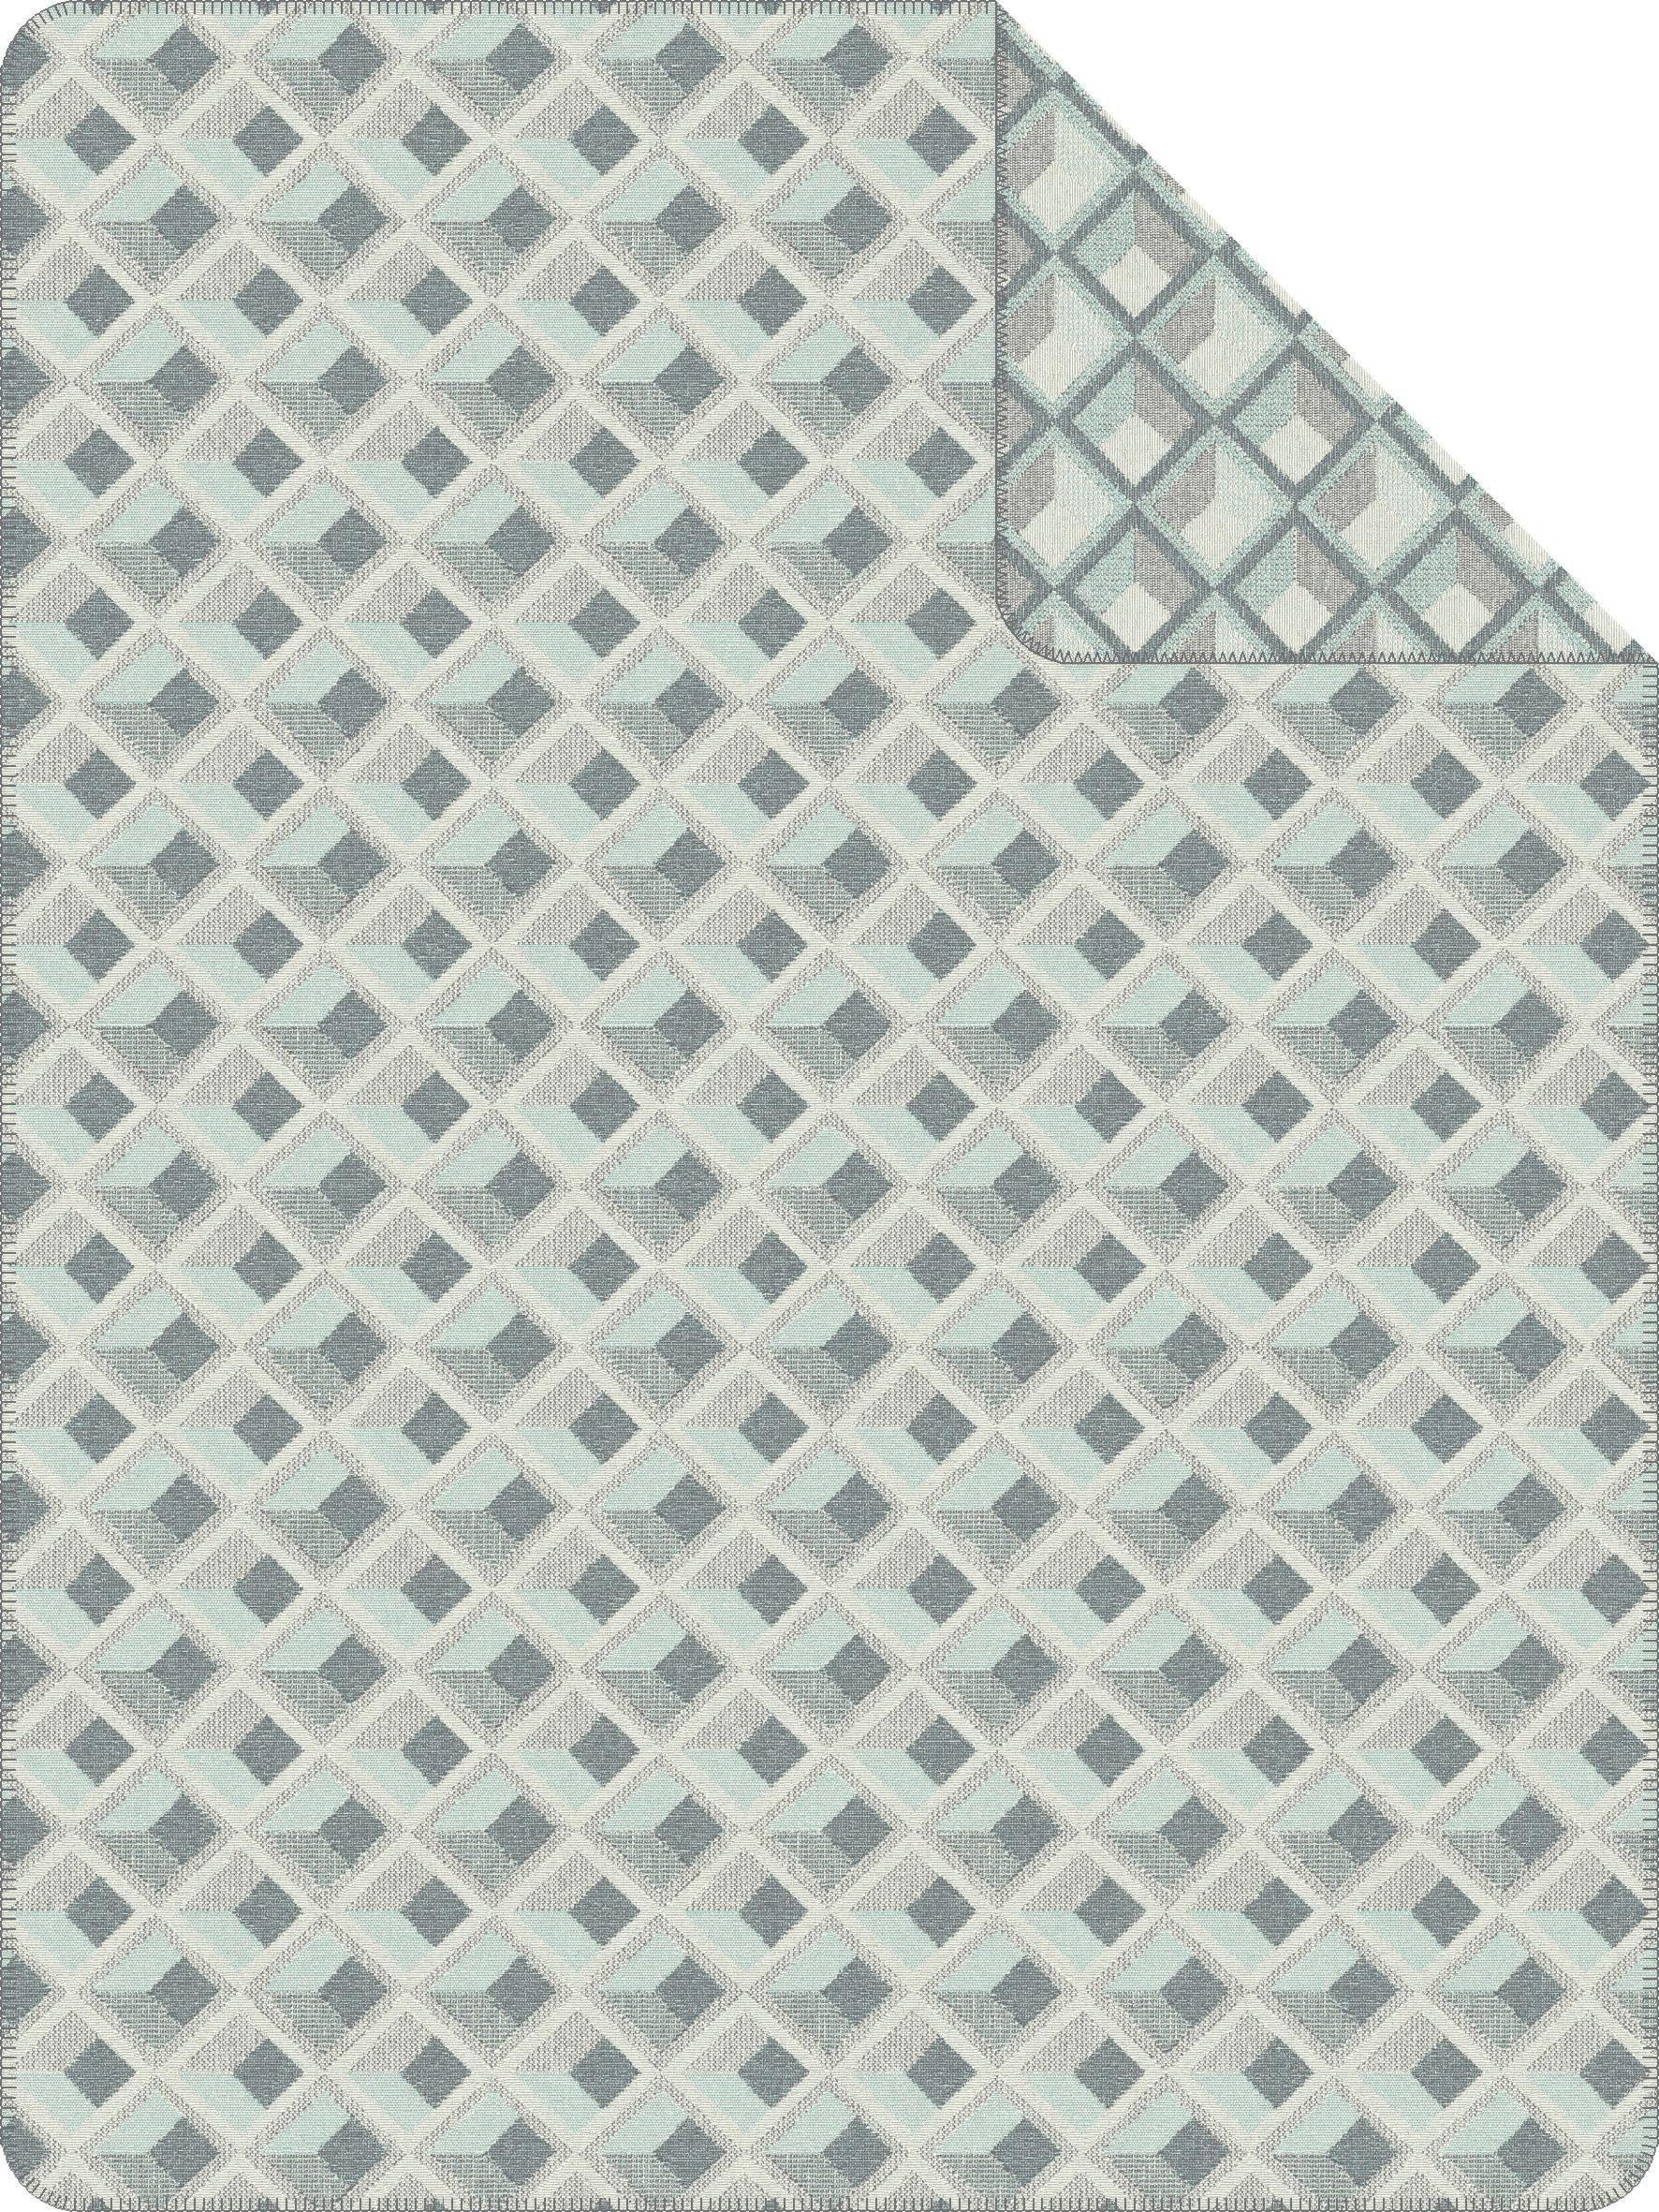 Wohndecke »Lieke«, IBENA, mit Muster